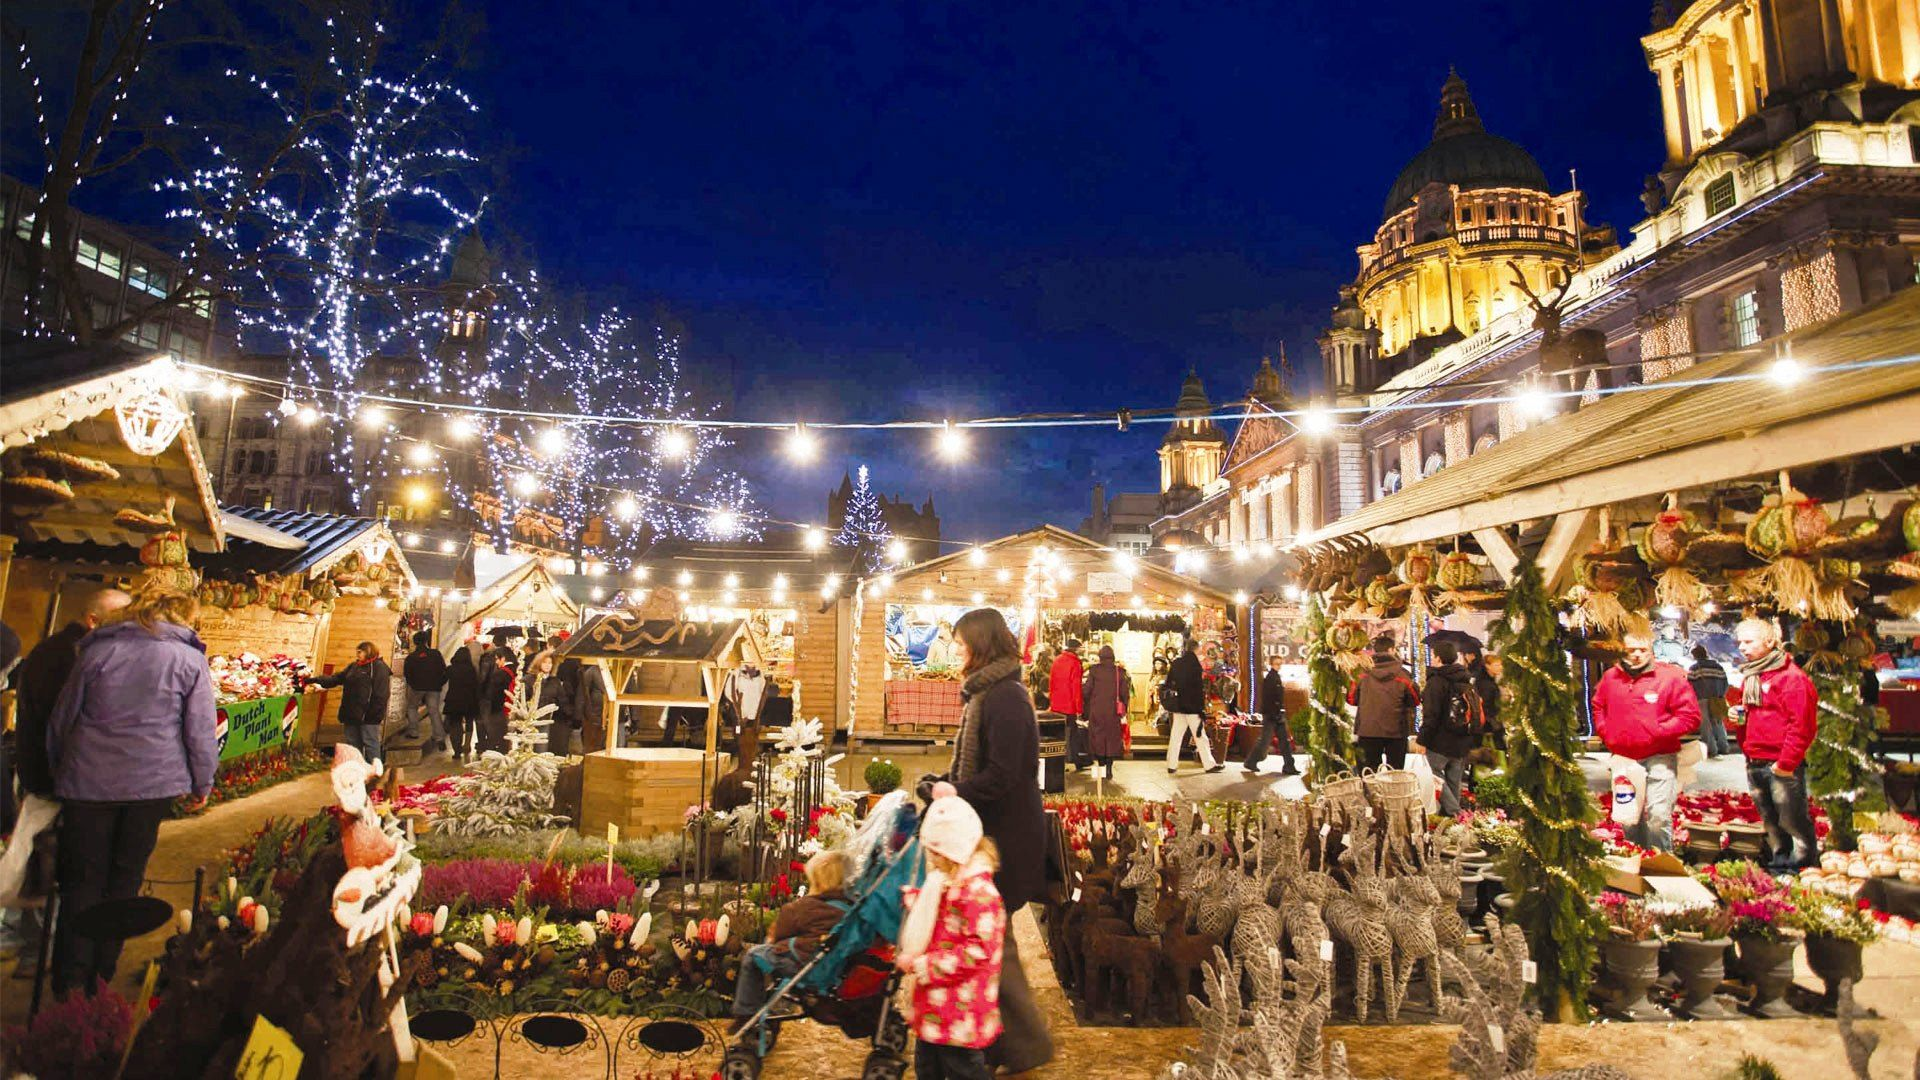 Christmas Markets Tourism in Europe Next Trip Tourism